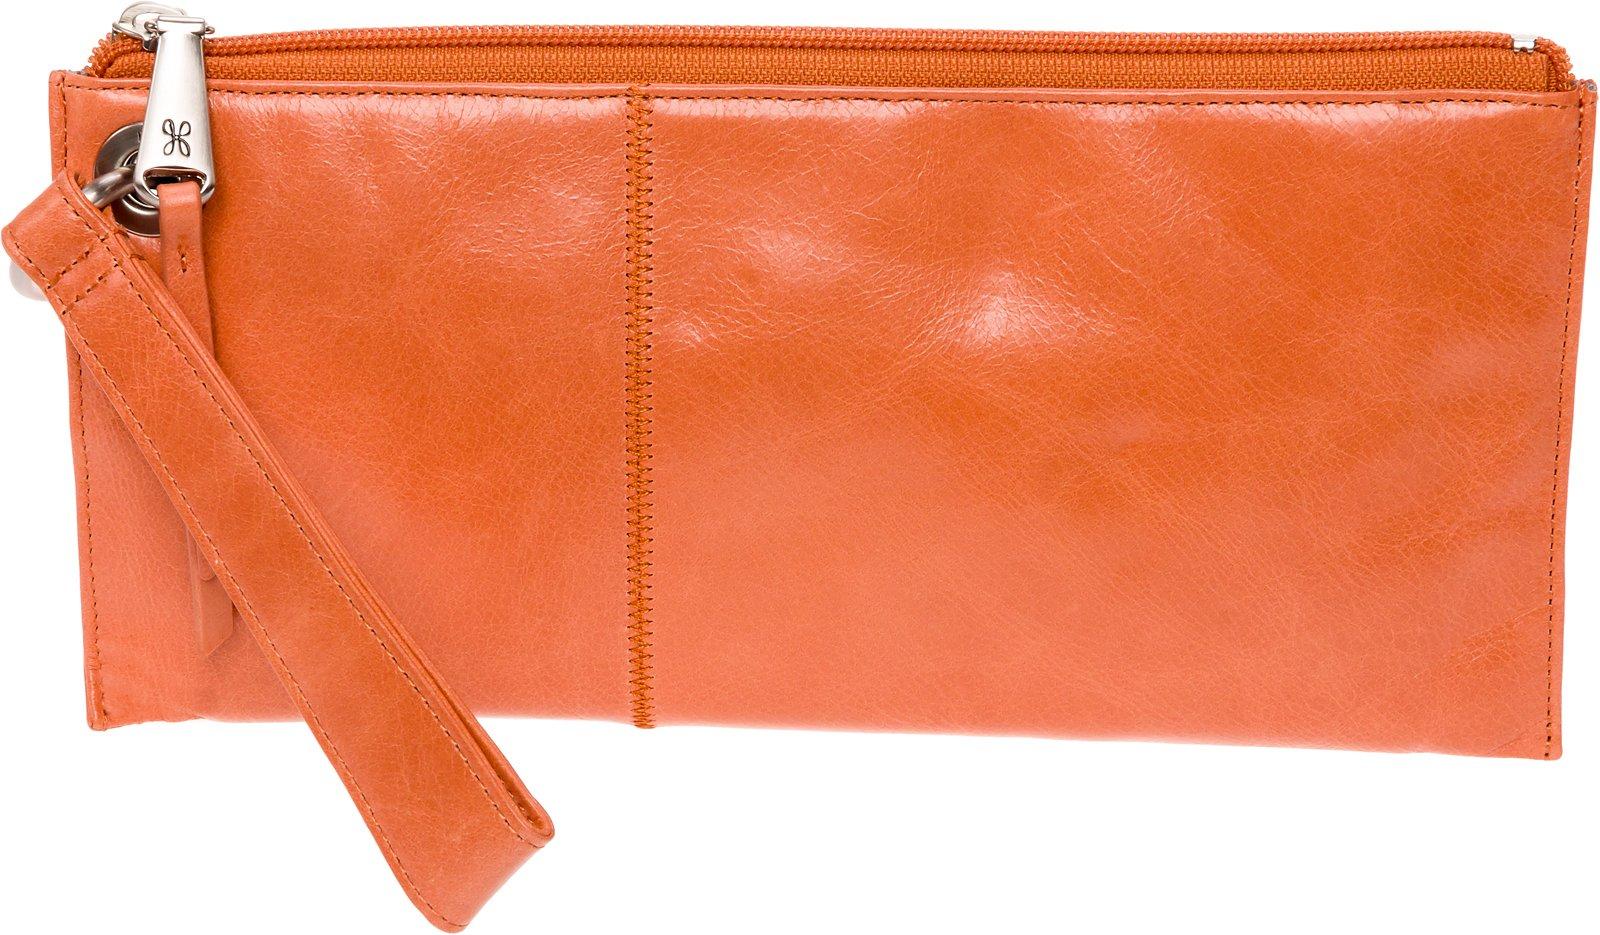 Hobo Womens Leather Vintage Vida Clutch Wallet (Persimmon)